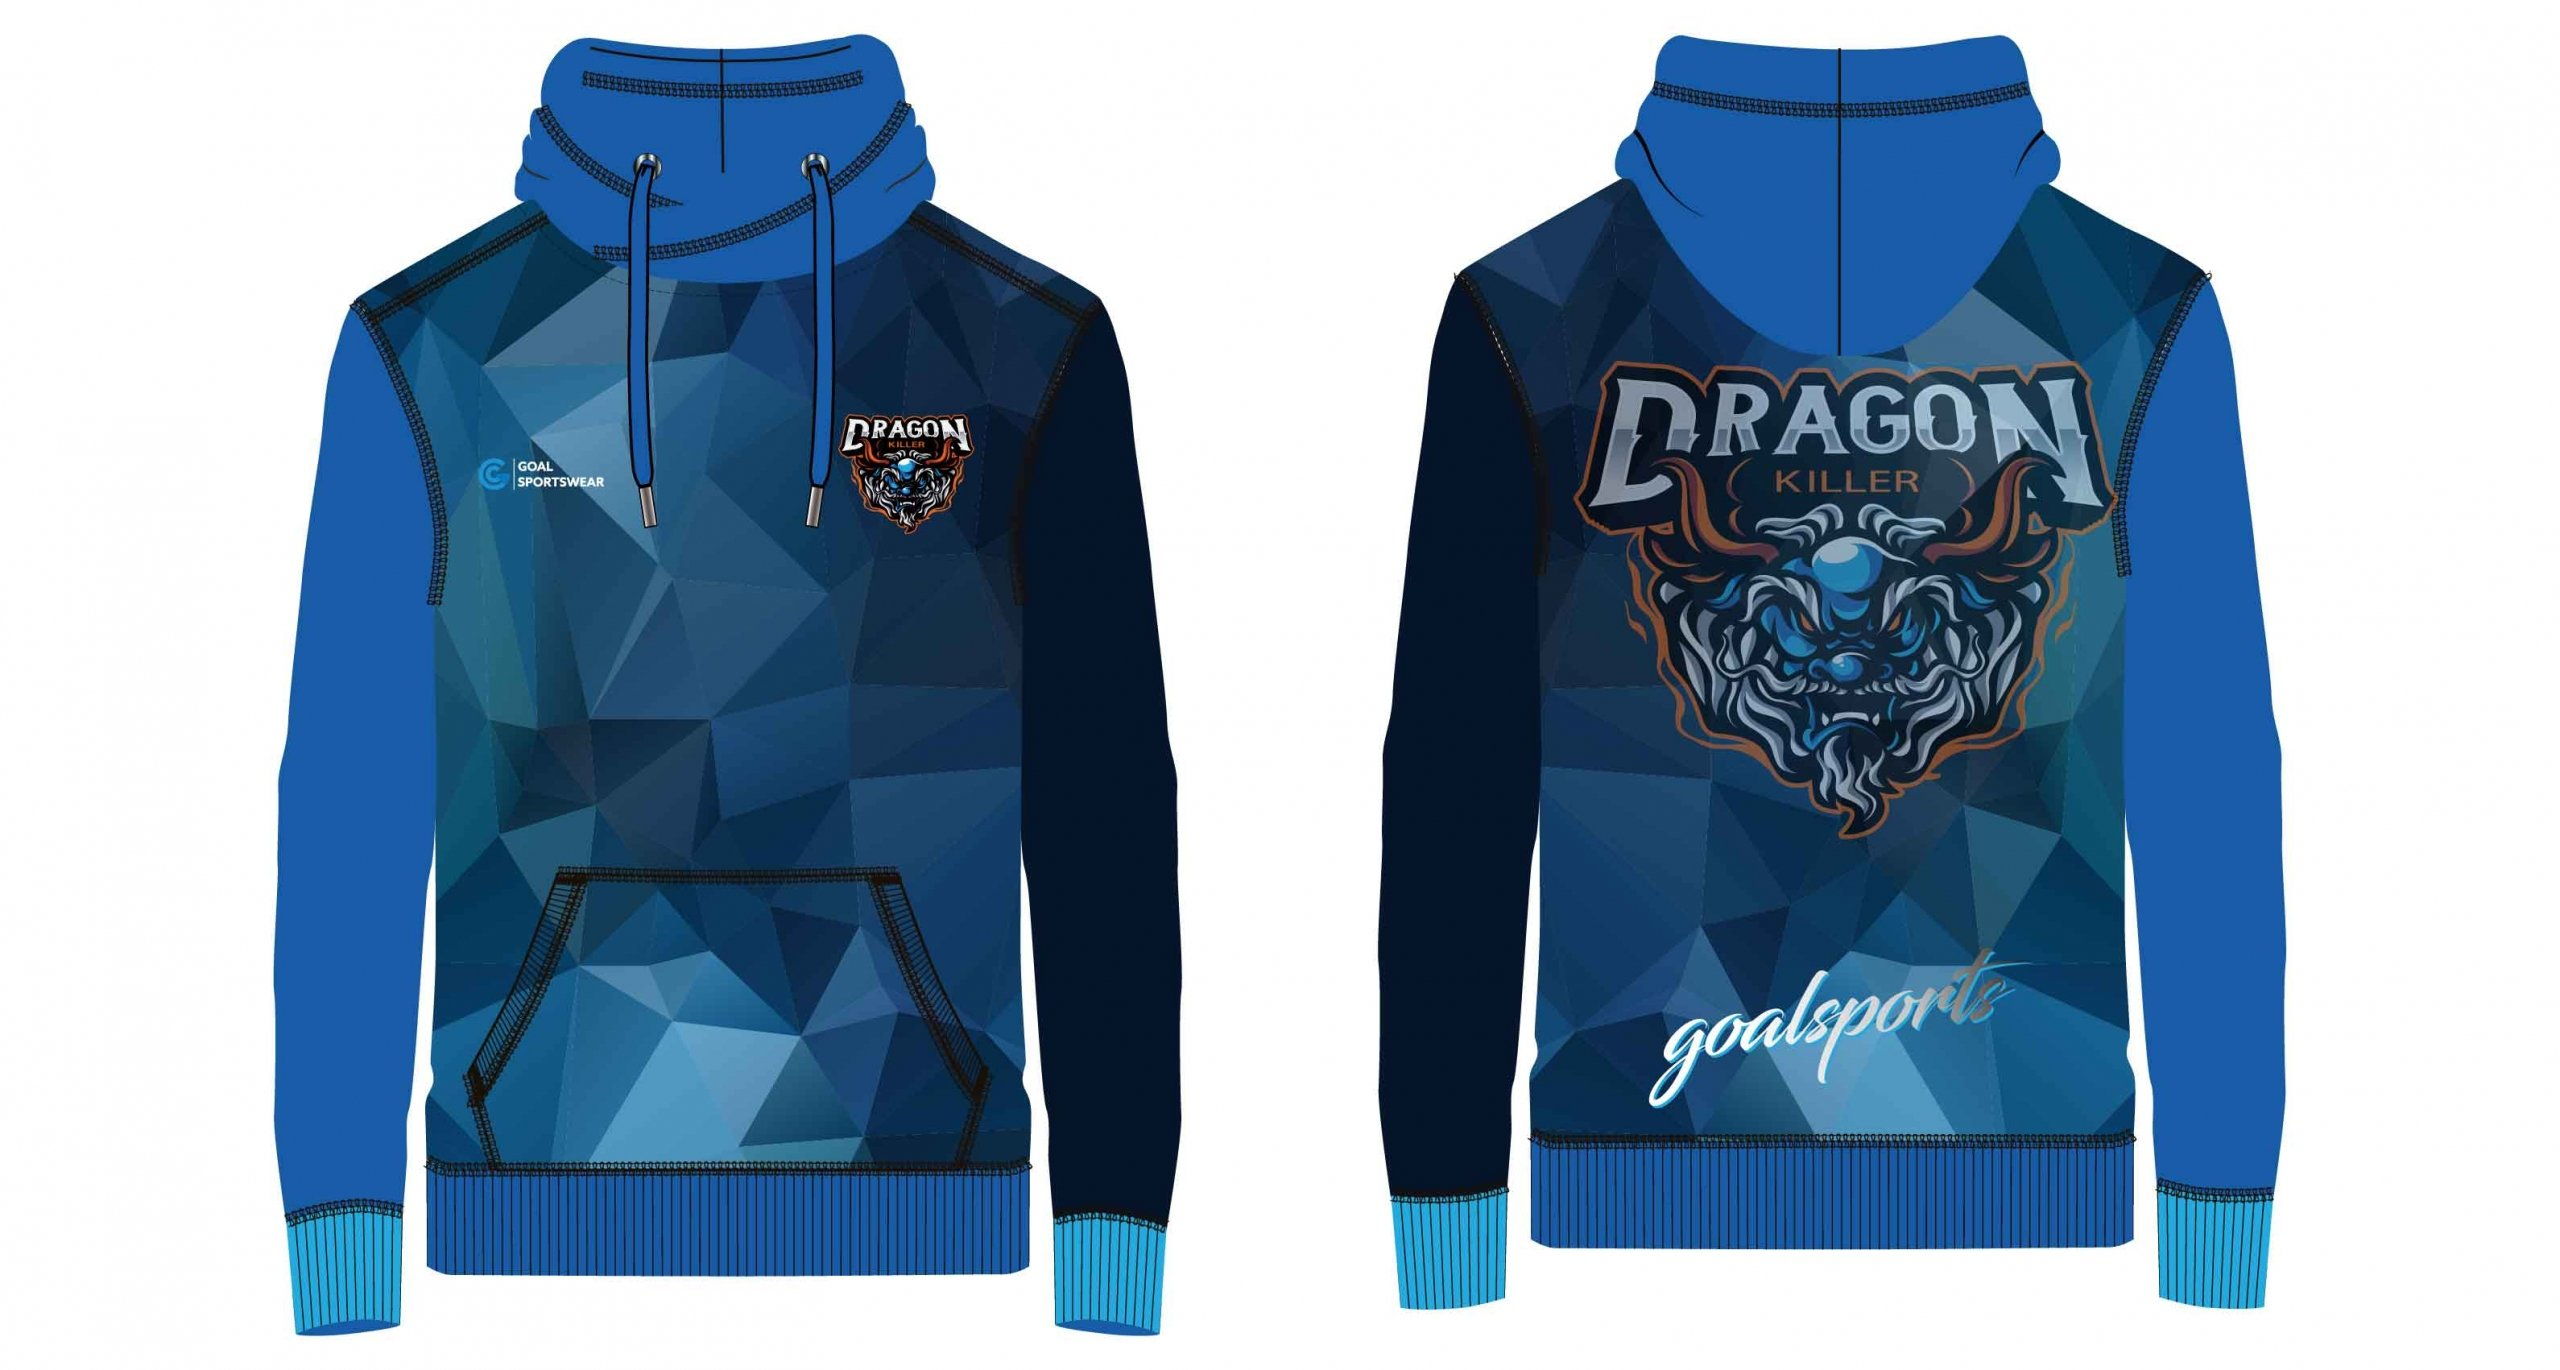 100% polyester sublimation printing custom youth team wrestling sweatshirts